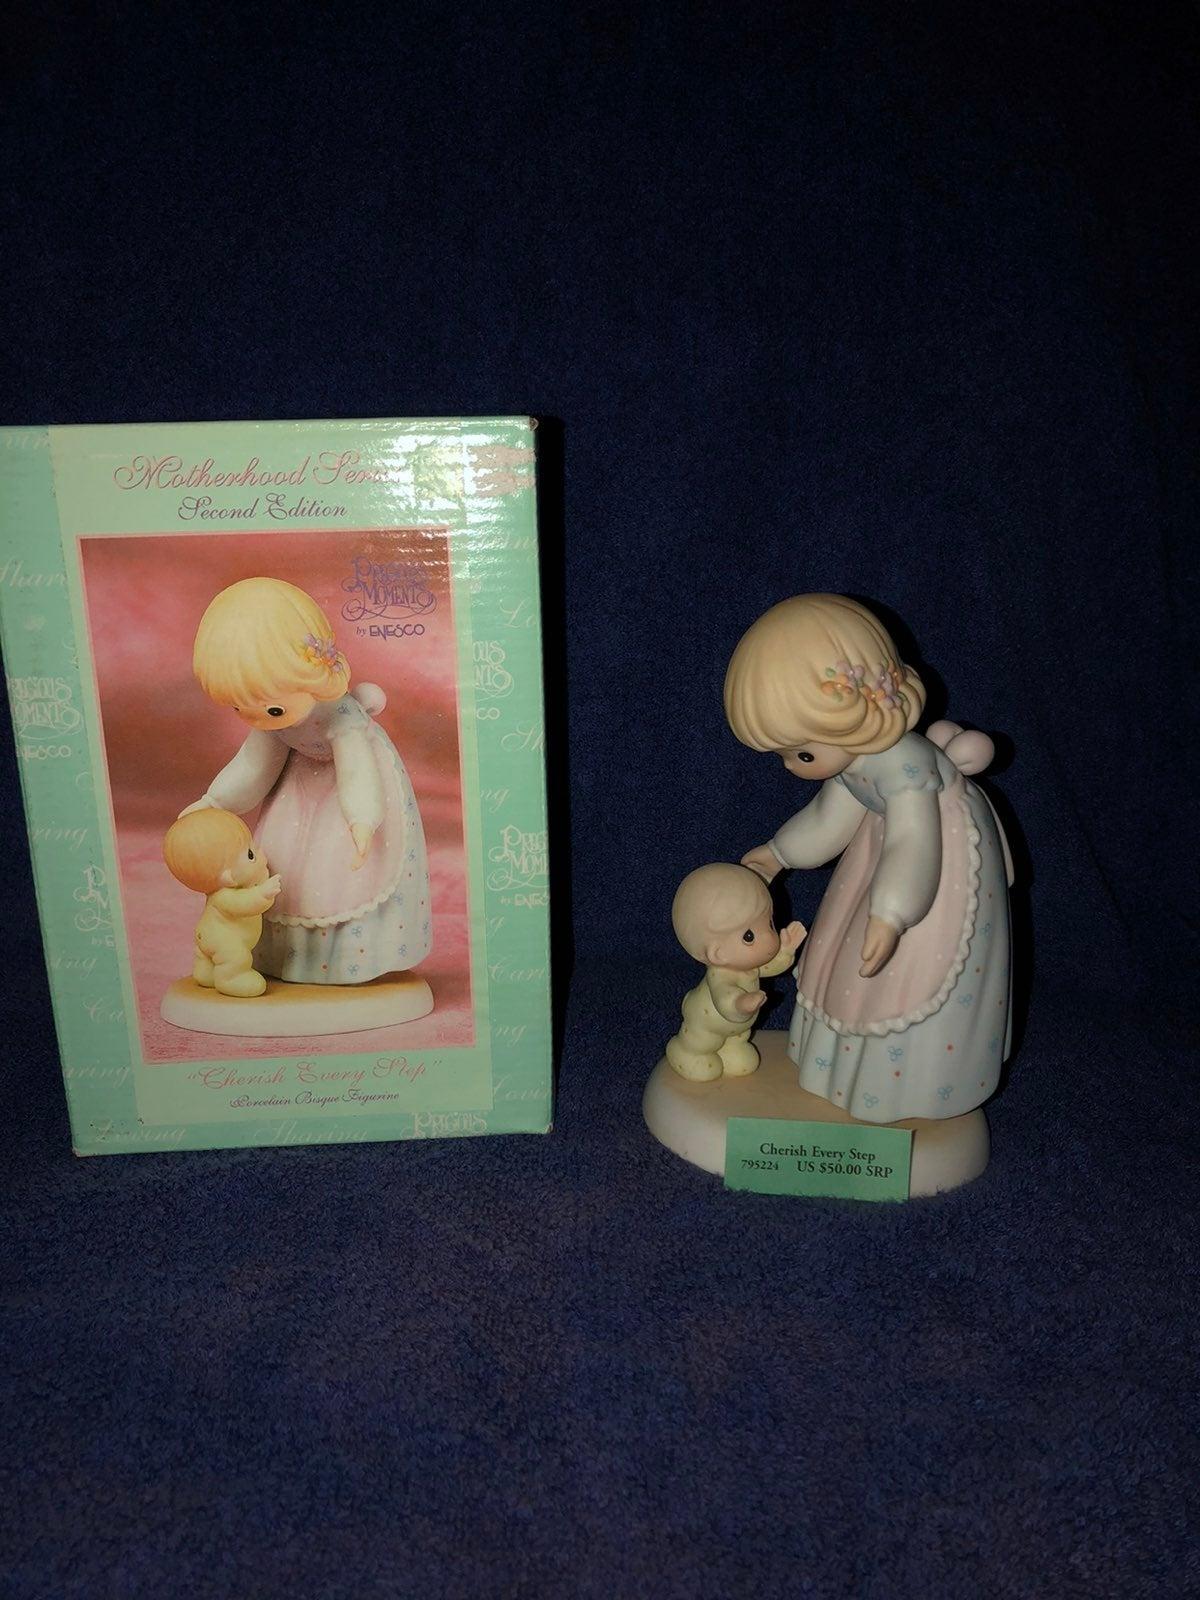 Precious Moments - Motherhood Series